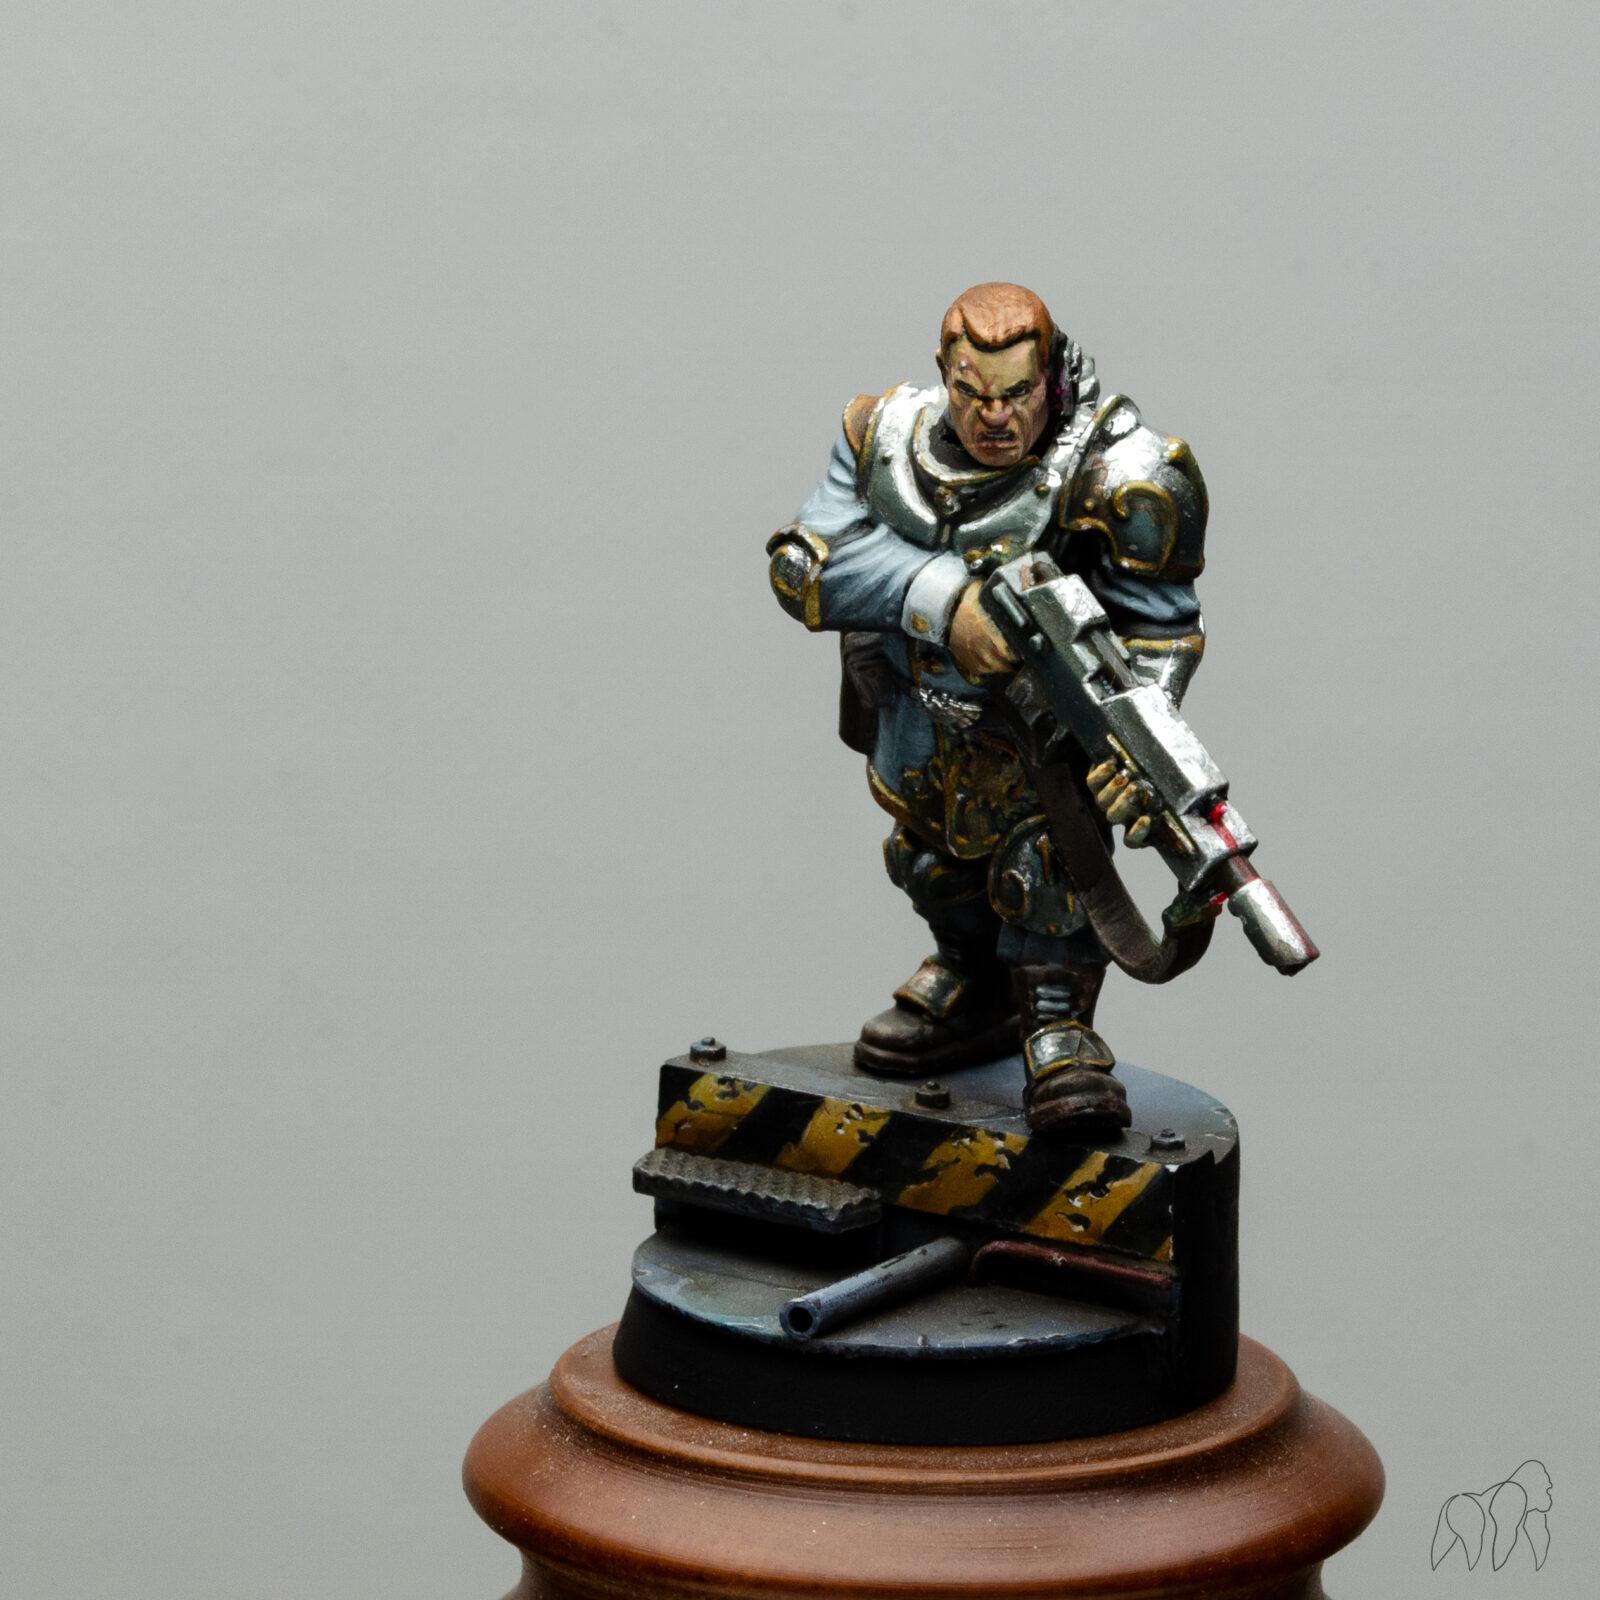 Imperialguardguy02